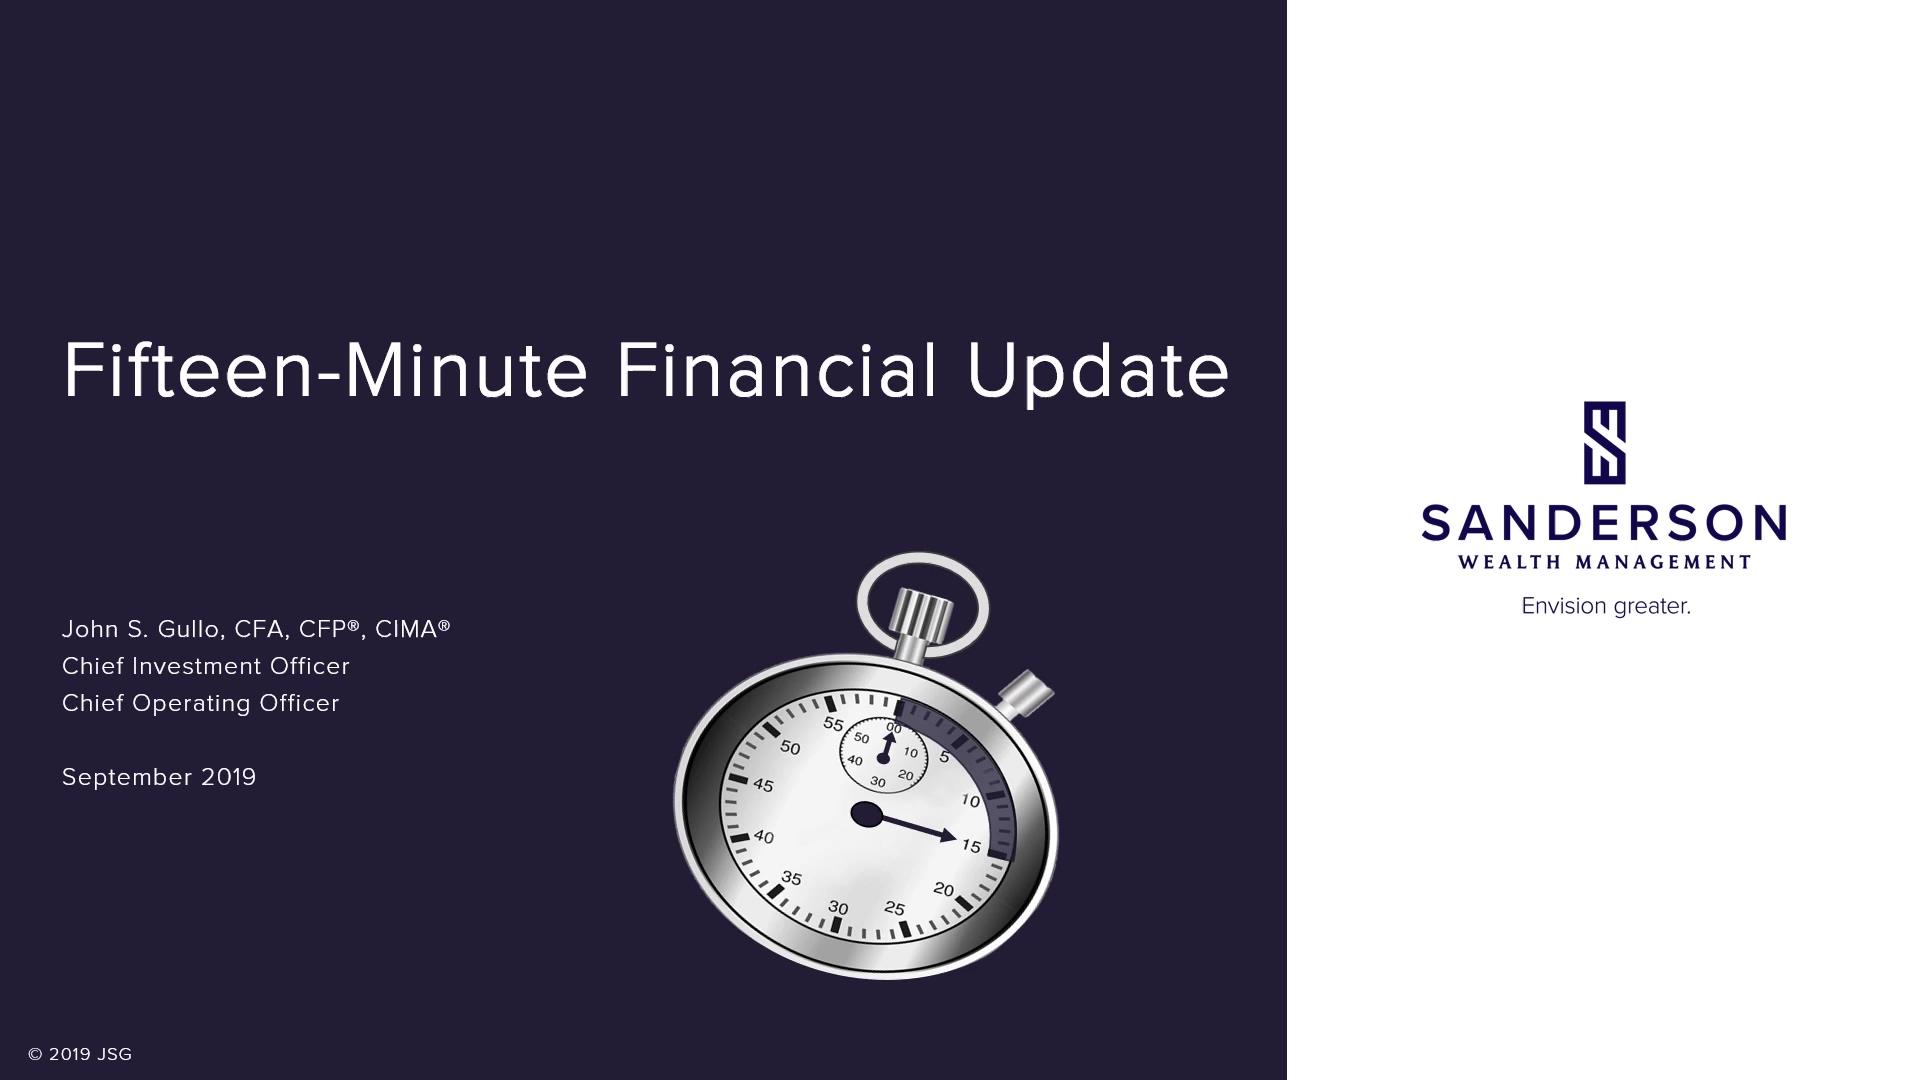 2019-Q3 Investment Review for Third Quarter 2019